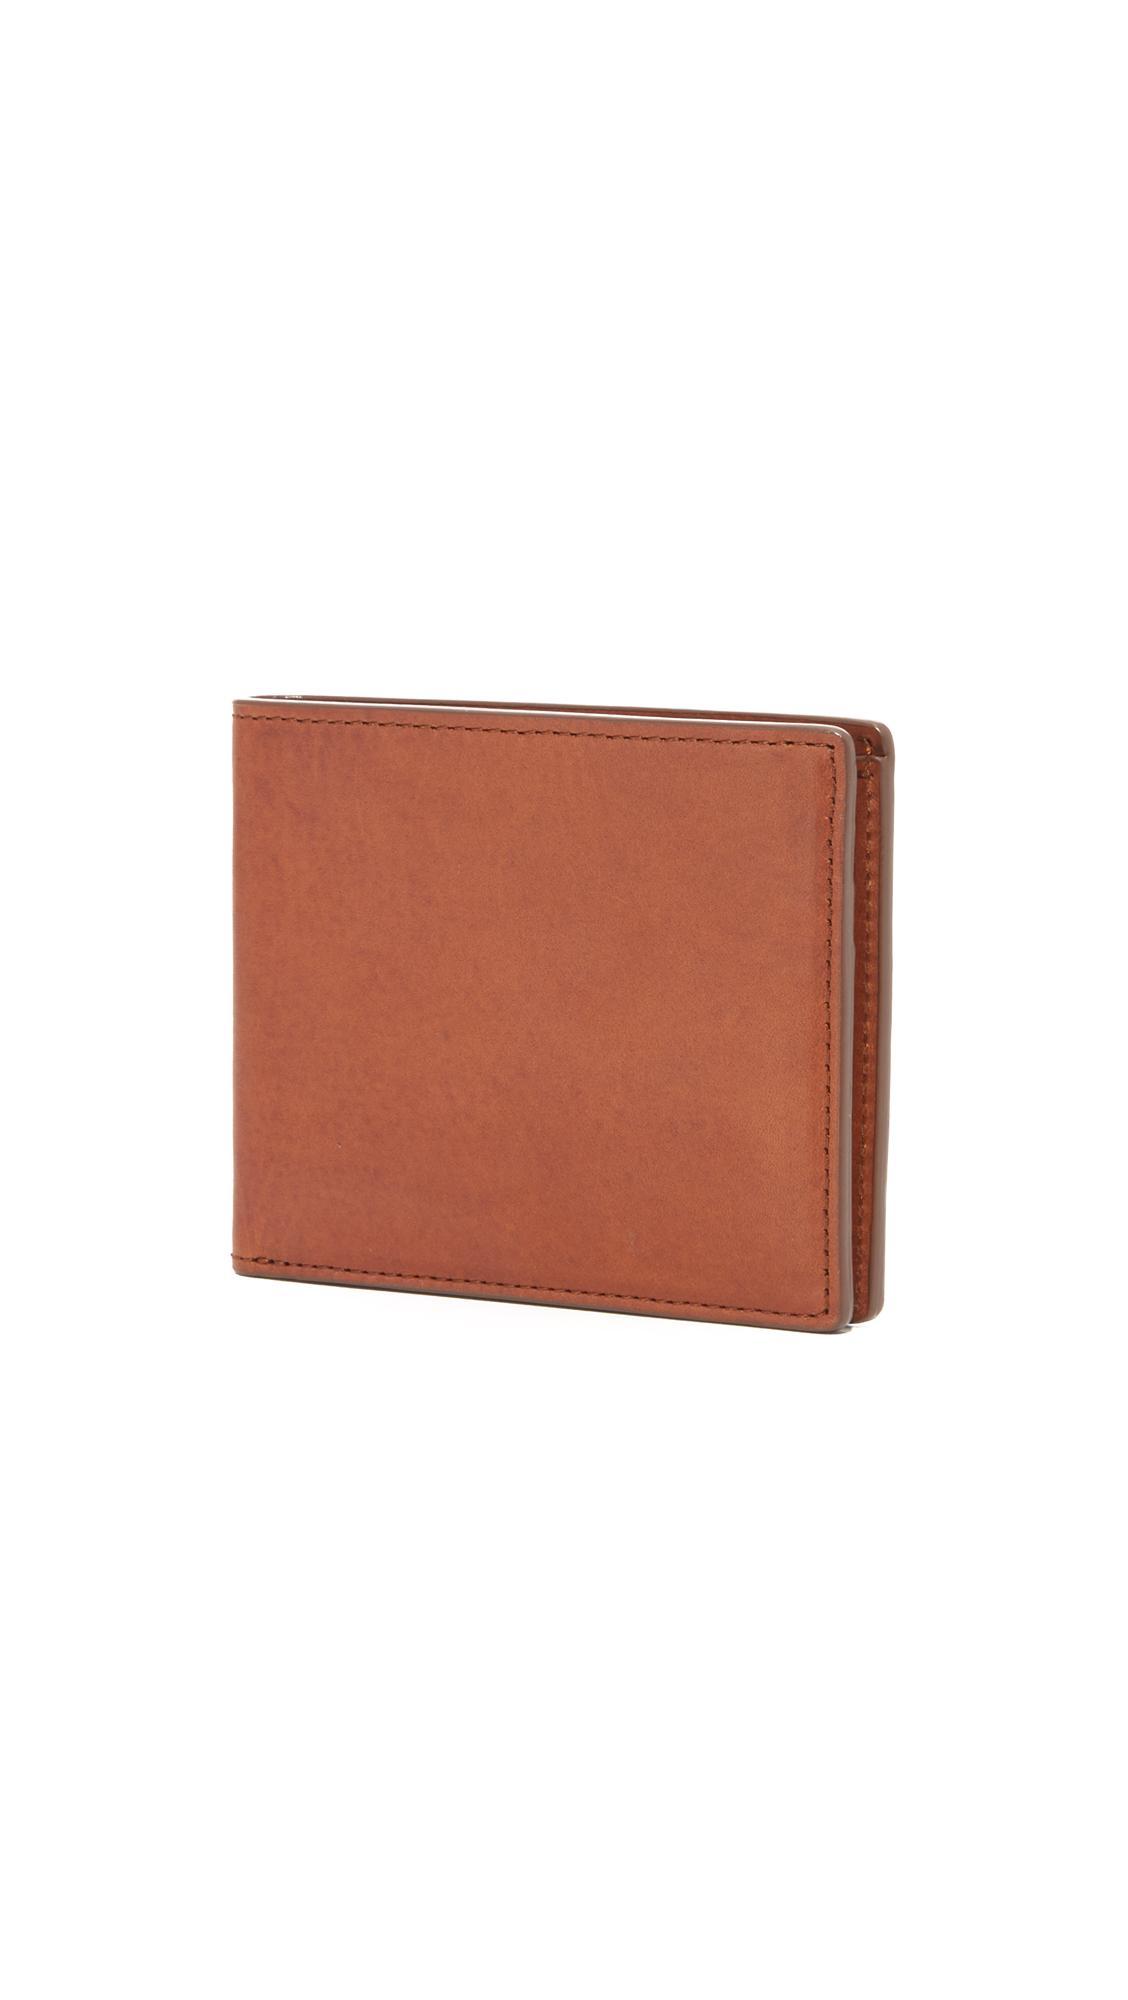 Rag Amp Bone Hampshire Wallet In Brown For Men Lyst